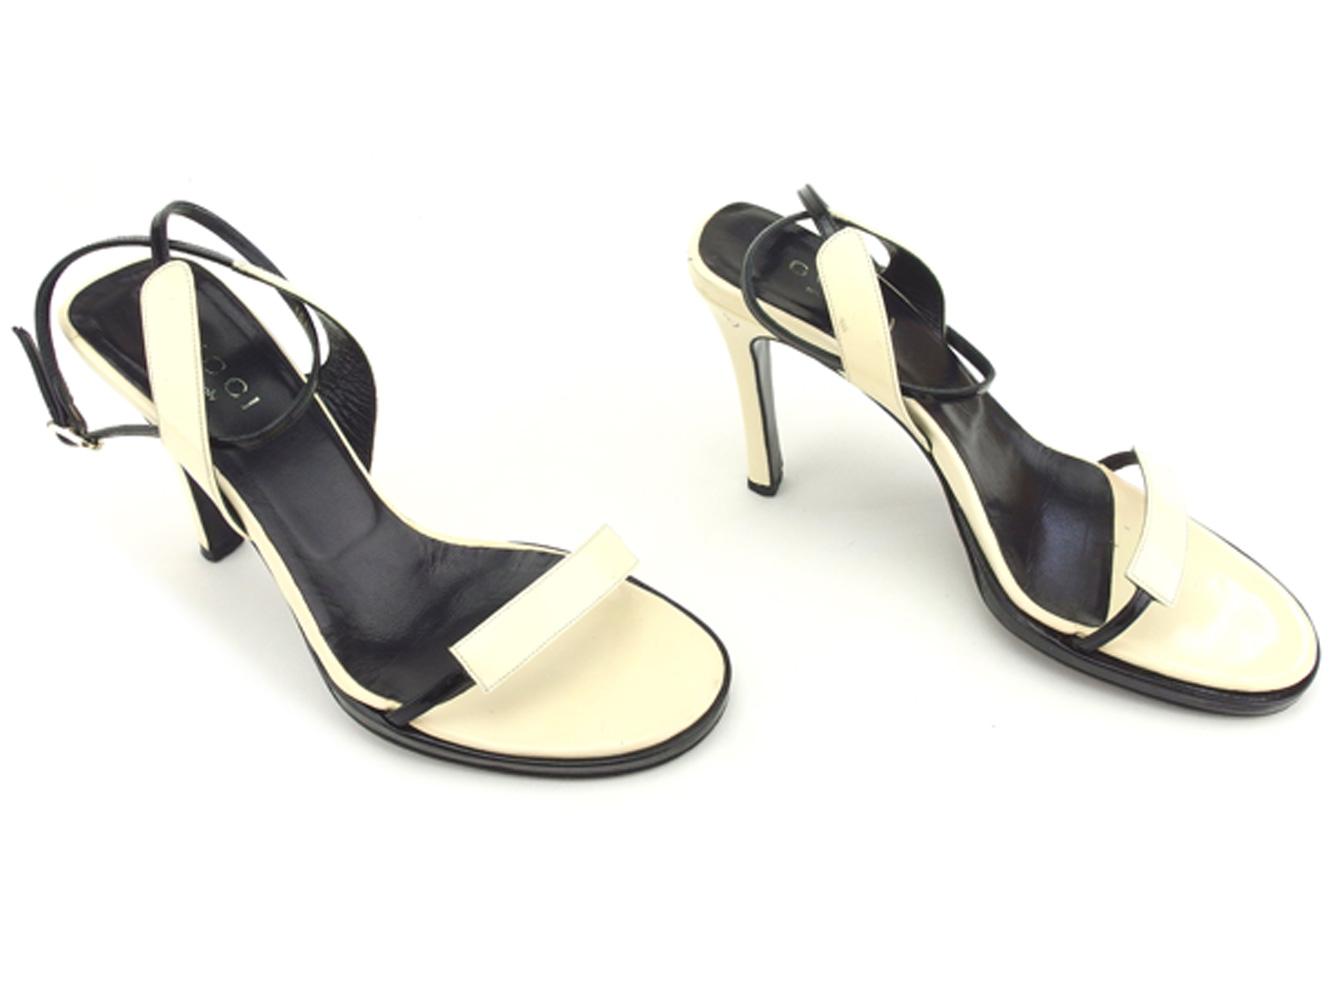 e50846341 ... Gucci GUCCI sandals shoes shoes Lady's ♯ 37C high-heeled shoes ankle  strap beige black ...